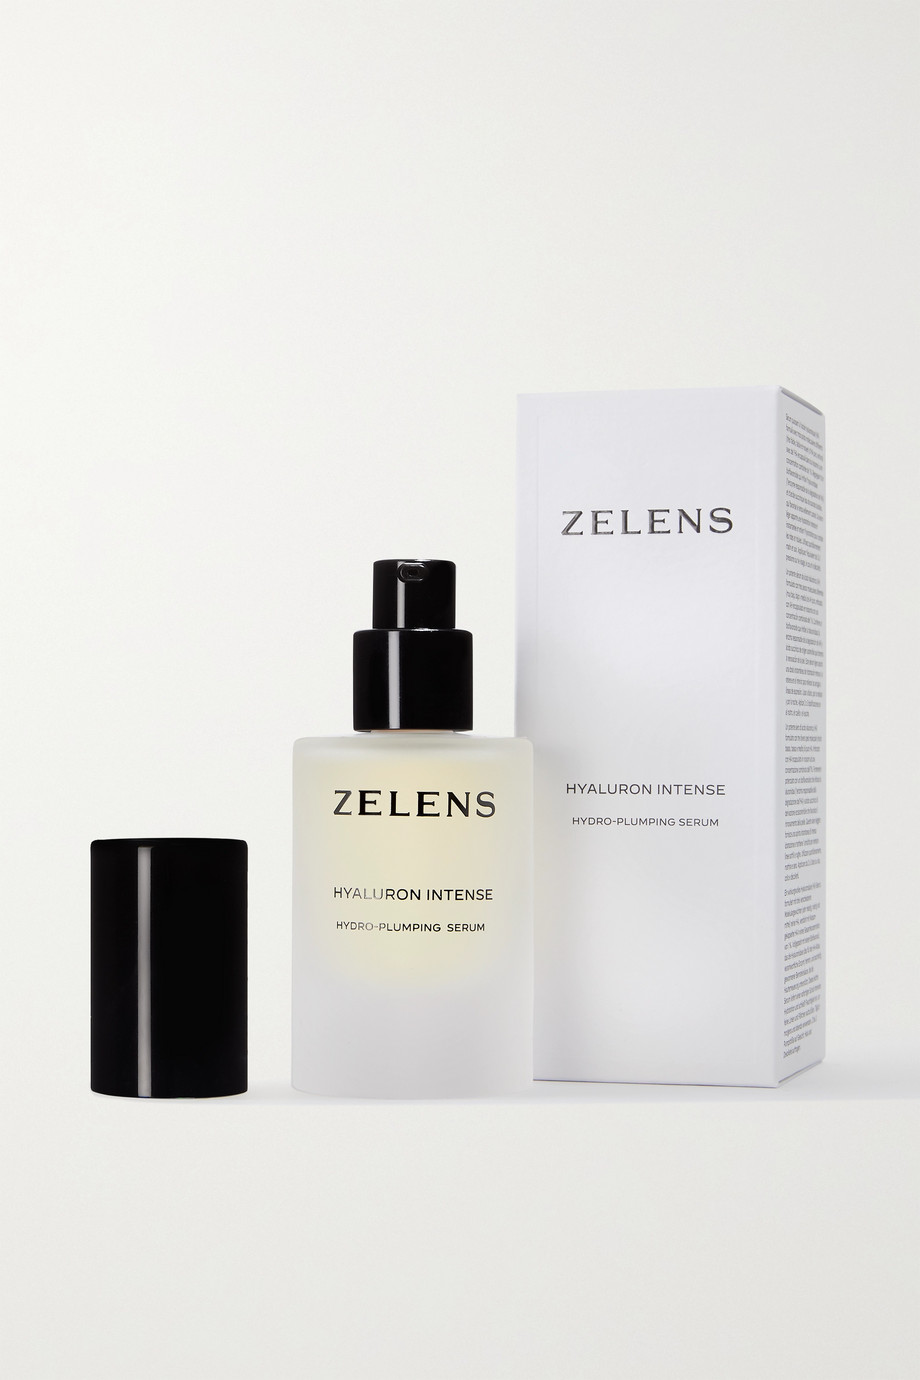 Zelens Sérum Hyaluronic Acid Complex Z Hyaluron, 30 ml